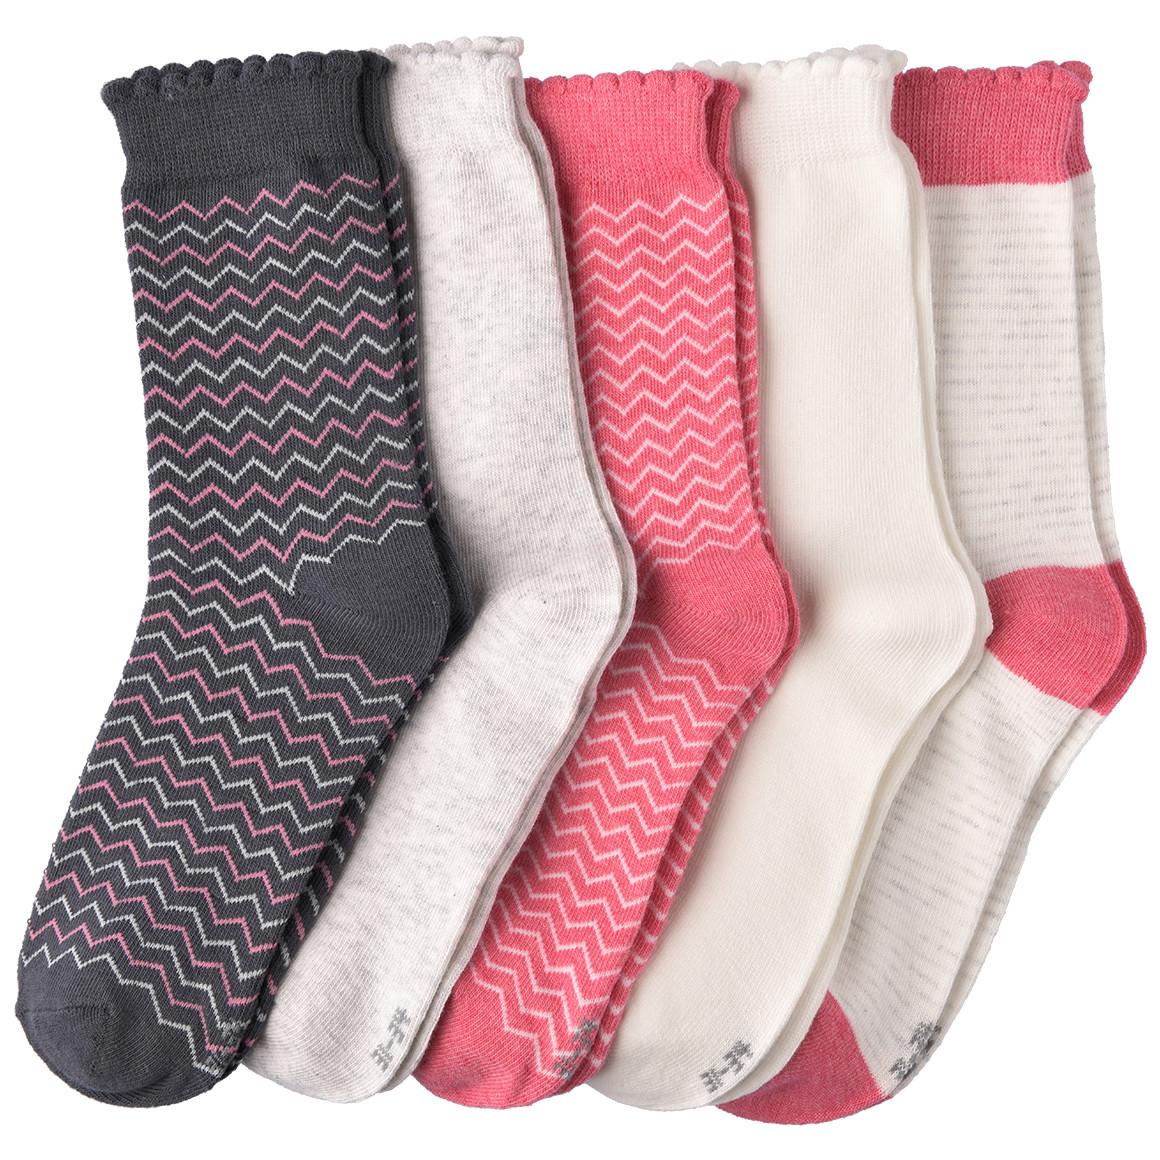 5 Paar Mädchen Socken